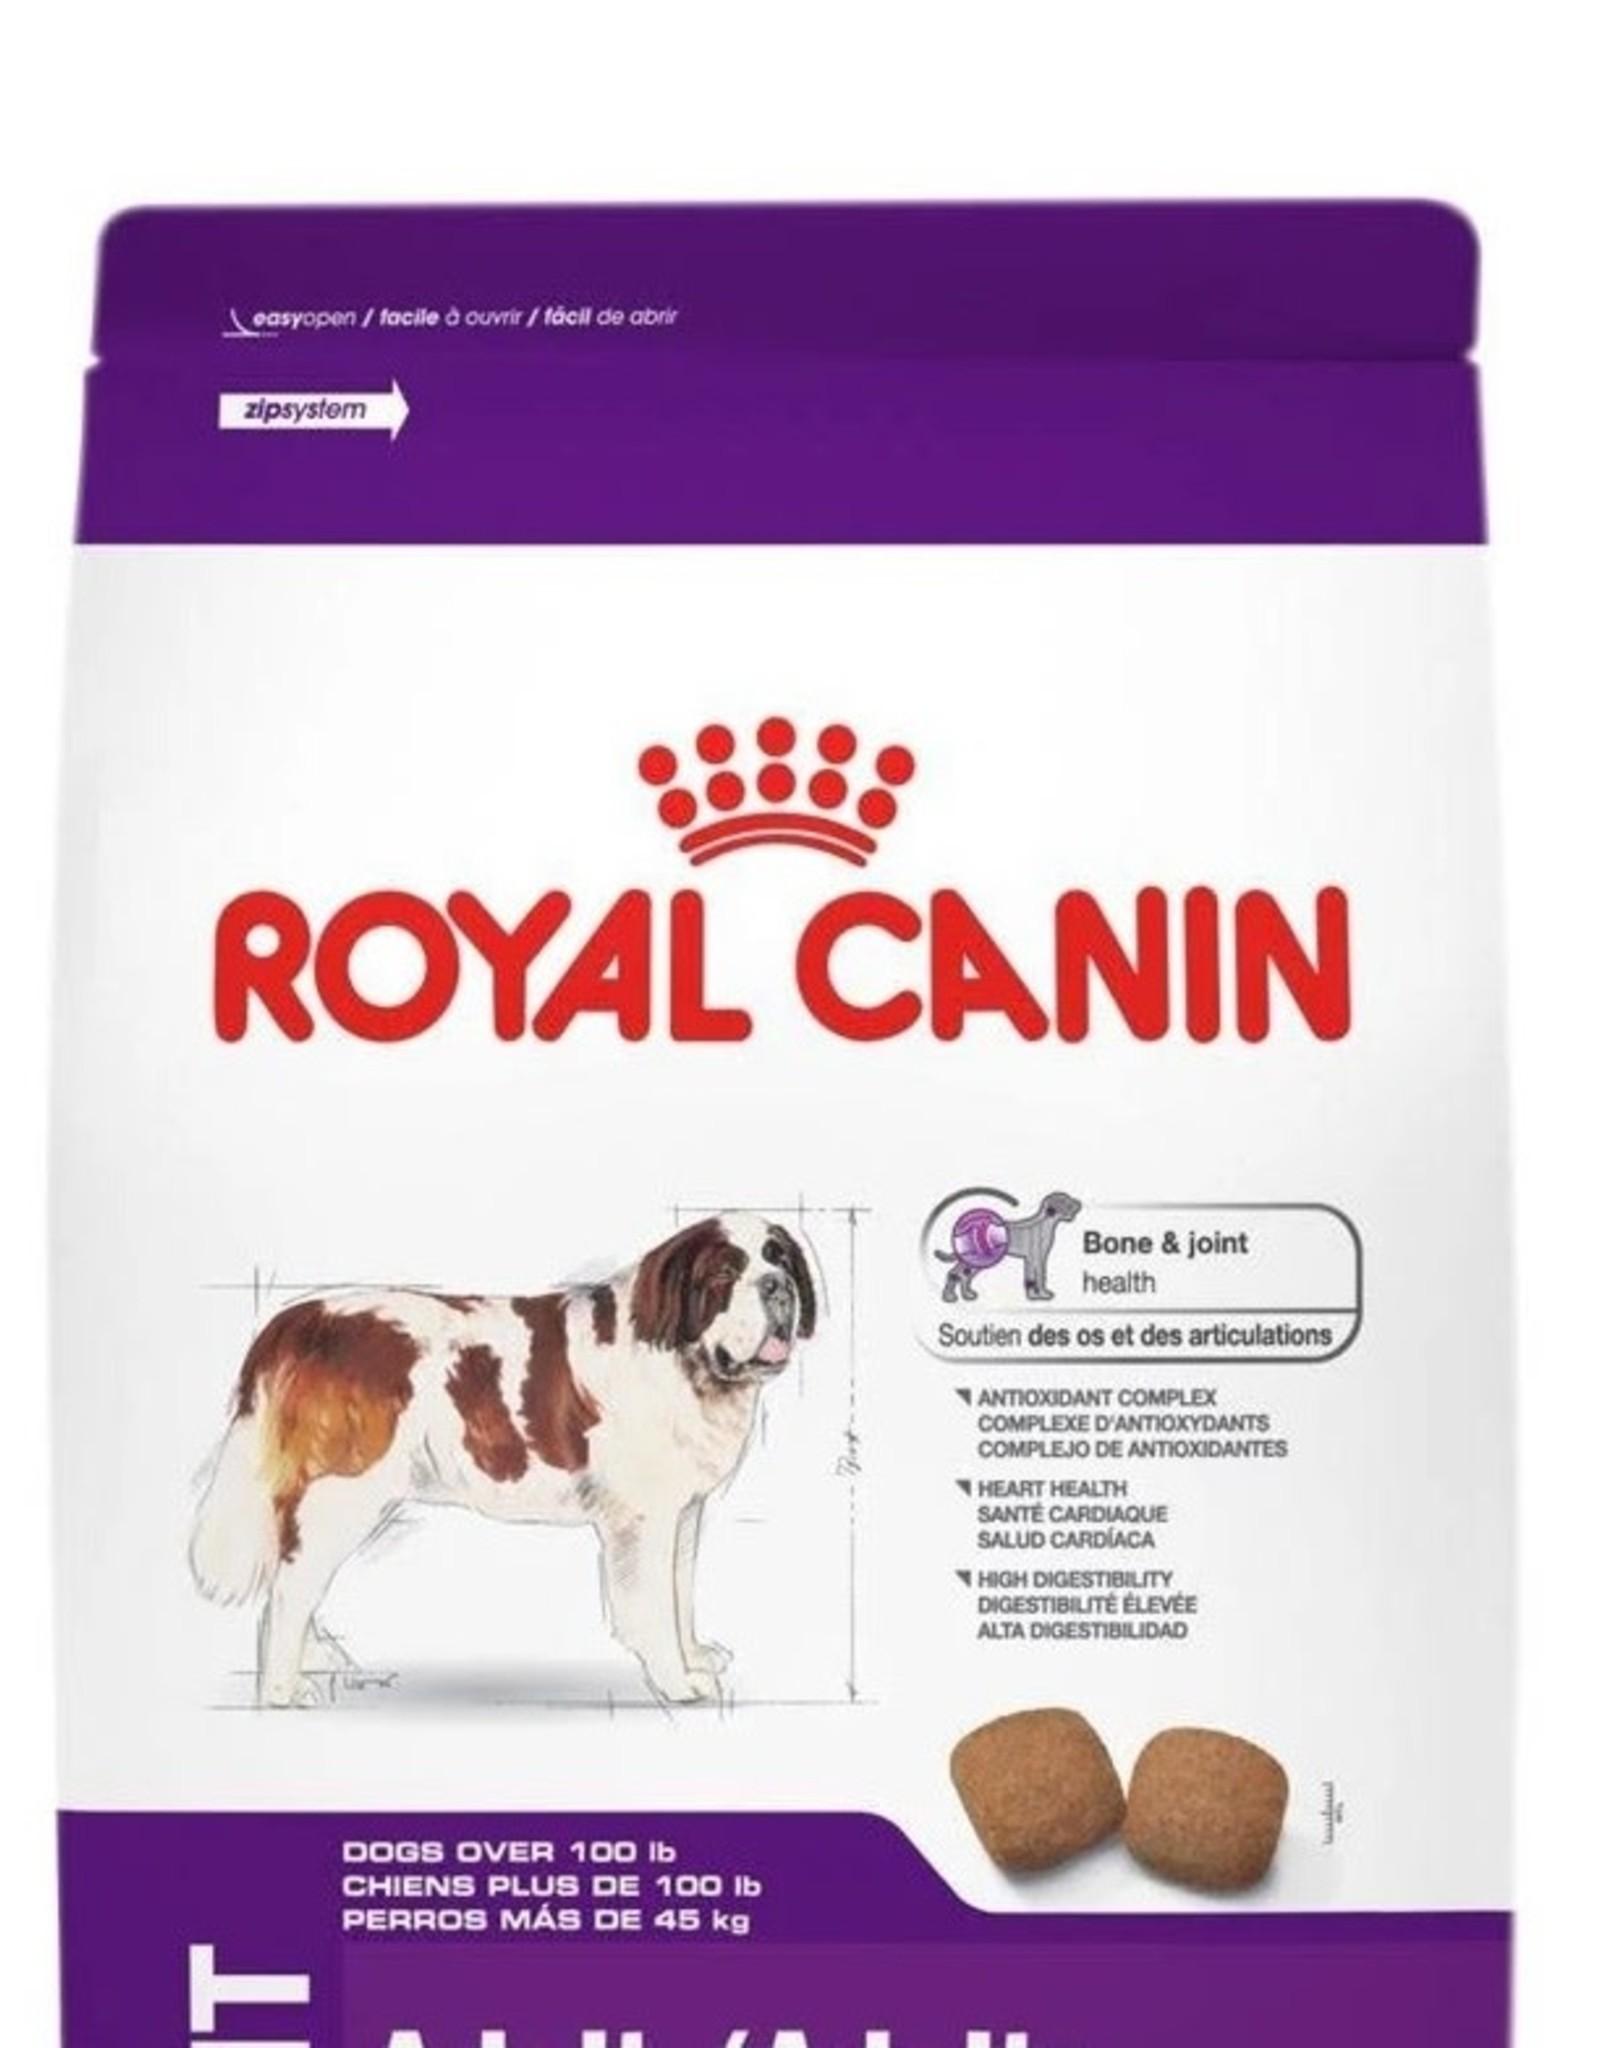 royal canin Royal Canin Giant Adult 35 lb